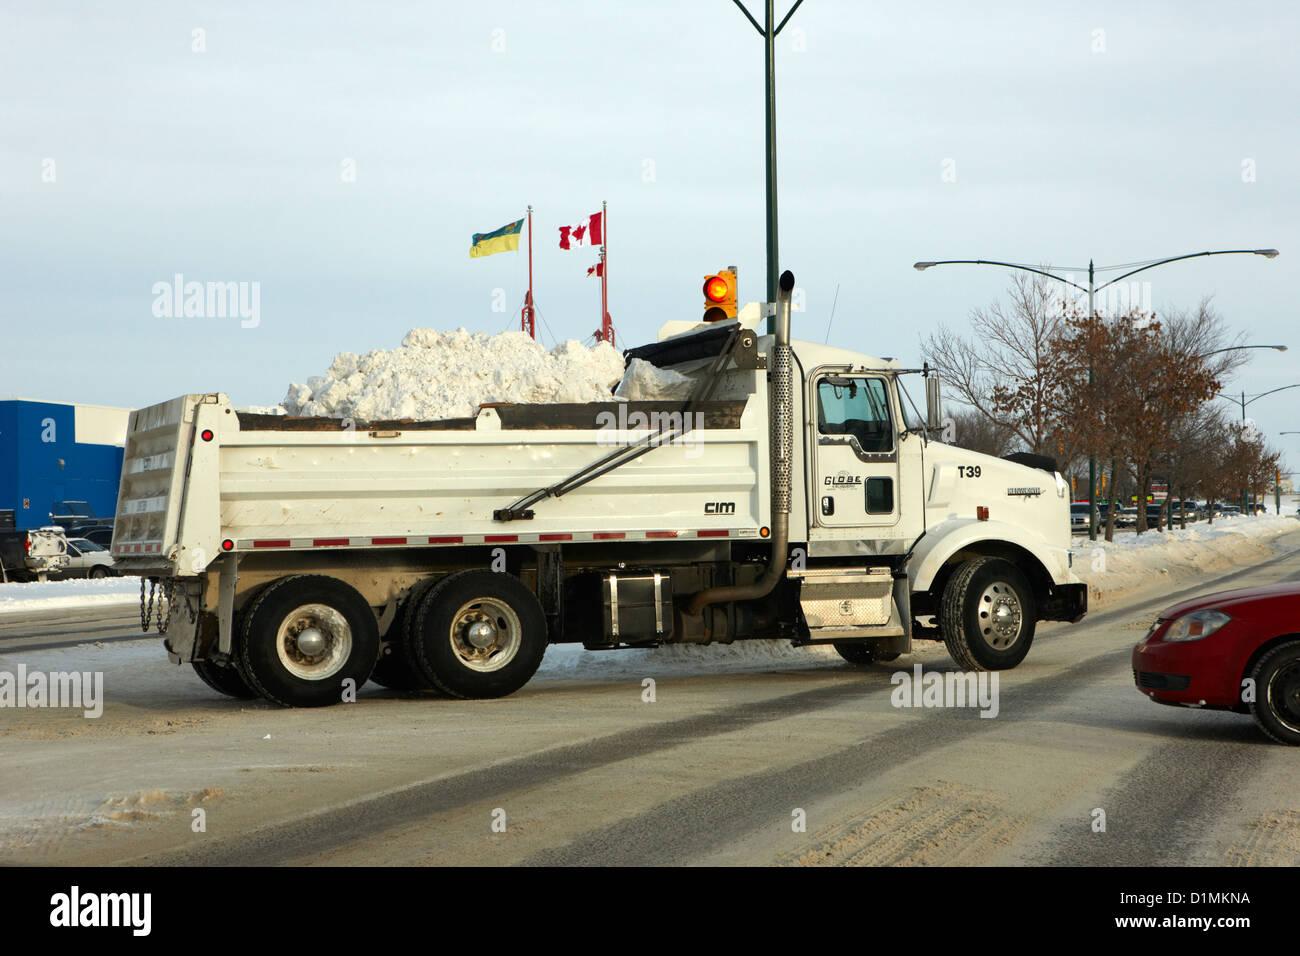 municipal city dump truck taking away snow cleared from parking lots and roads in Saskatoon Saskatchewan Canada - Stock Image